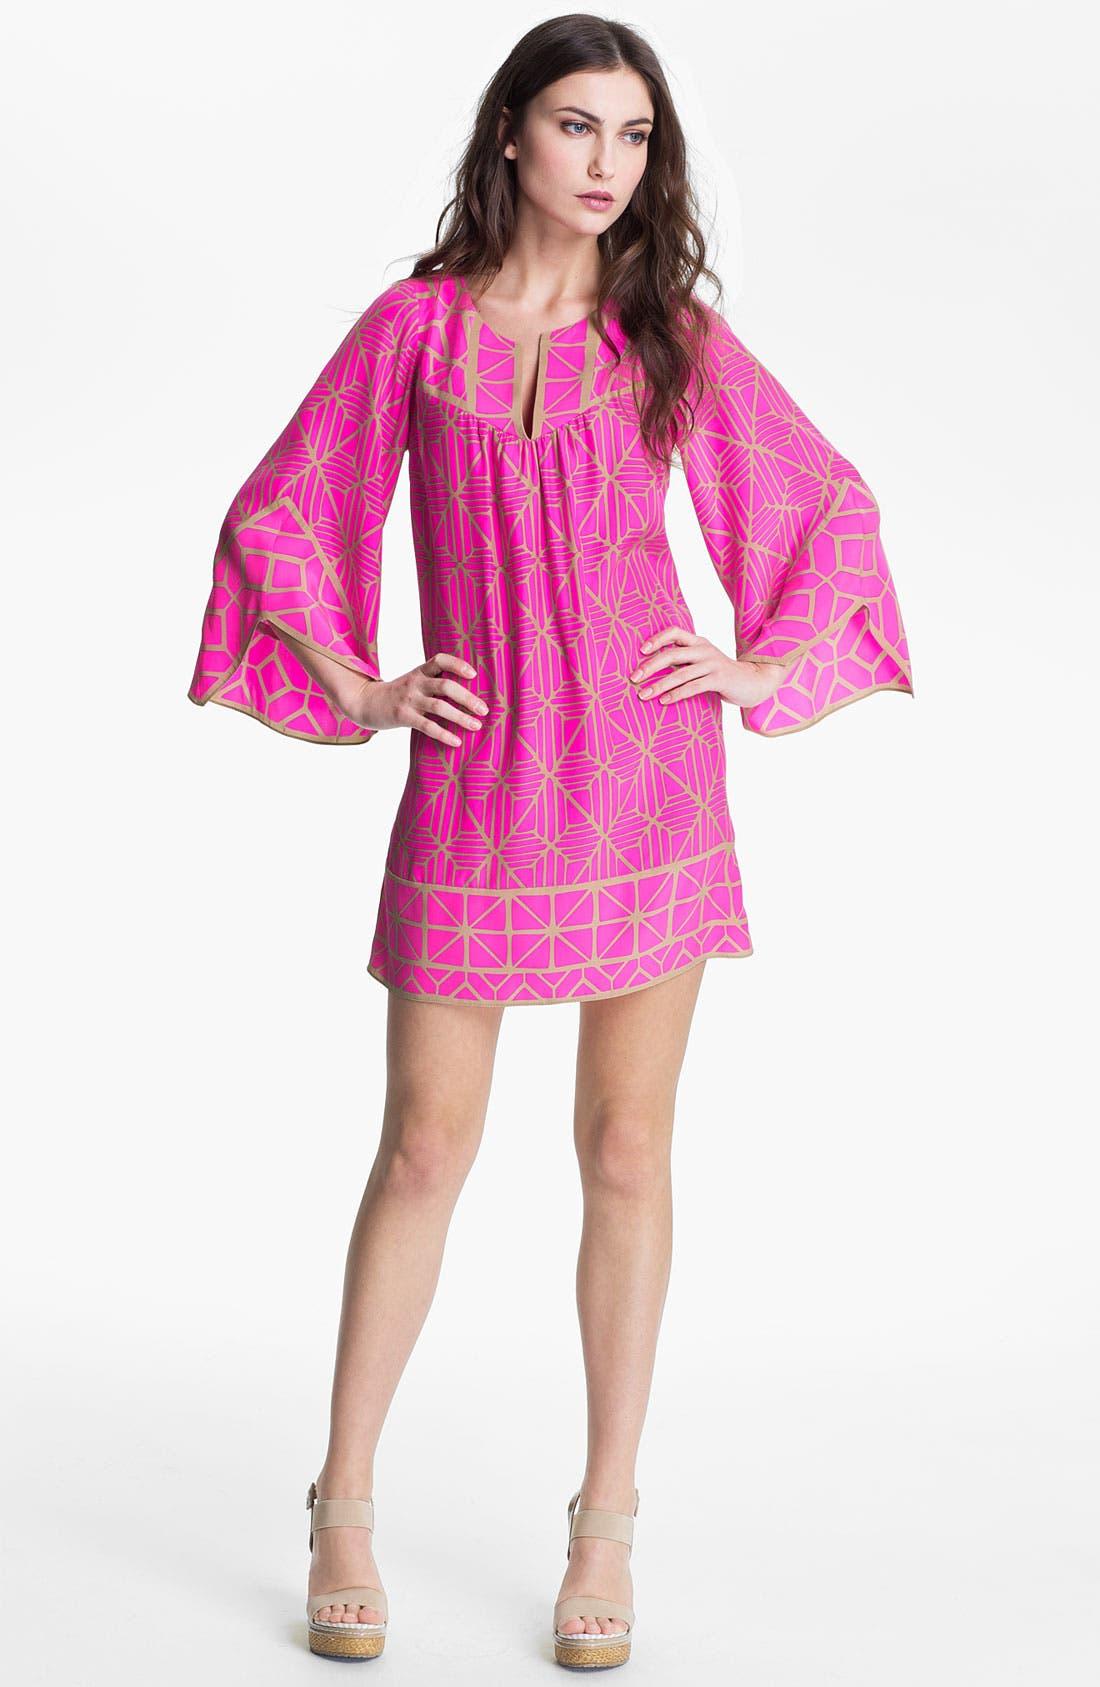 Alternate Image 1 Selected - ALICE & TRIXIE 'Jillian' Bell Sleeve Silk Tunic Dress